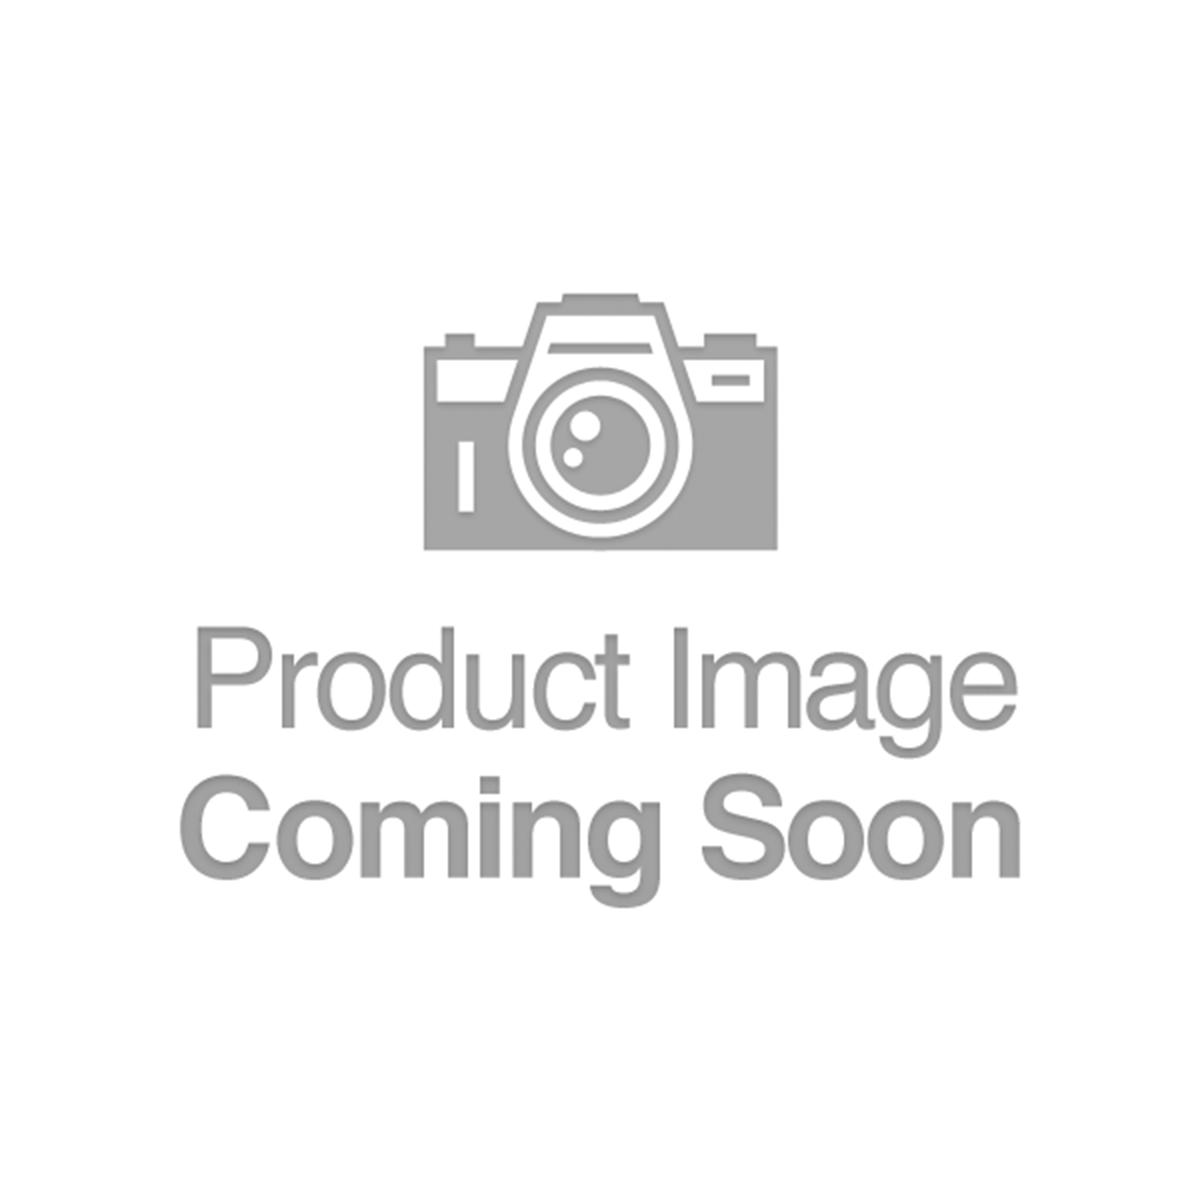 (ca. 1825-29) Richard Trested Six Cents token. Brass, 24 mm. Rulau-E NY 923. AU-58 (NGC).